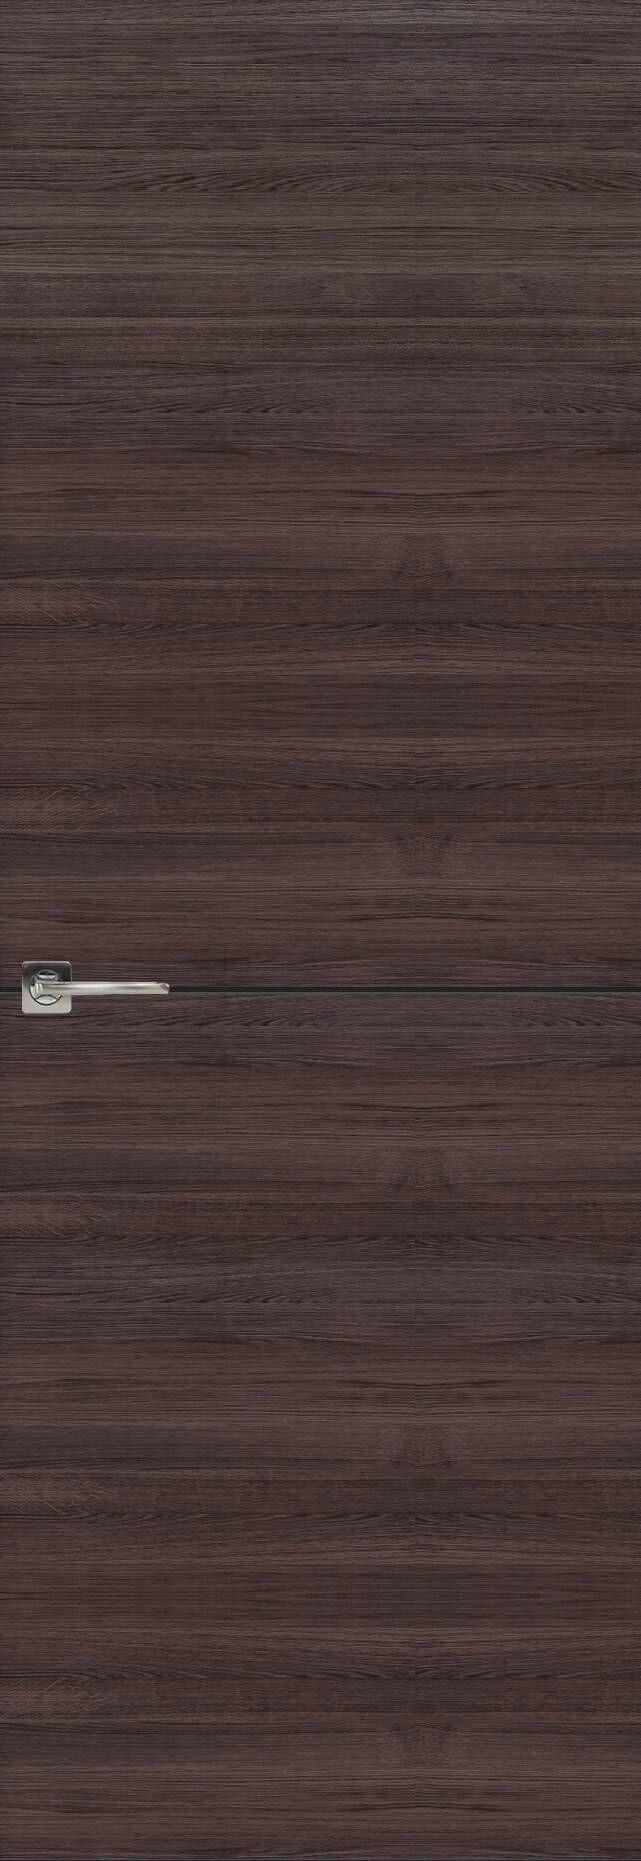 Tivoli Б-2 невидимка цвет - Венге Нуар Без стекла (ДГ)